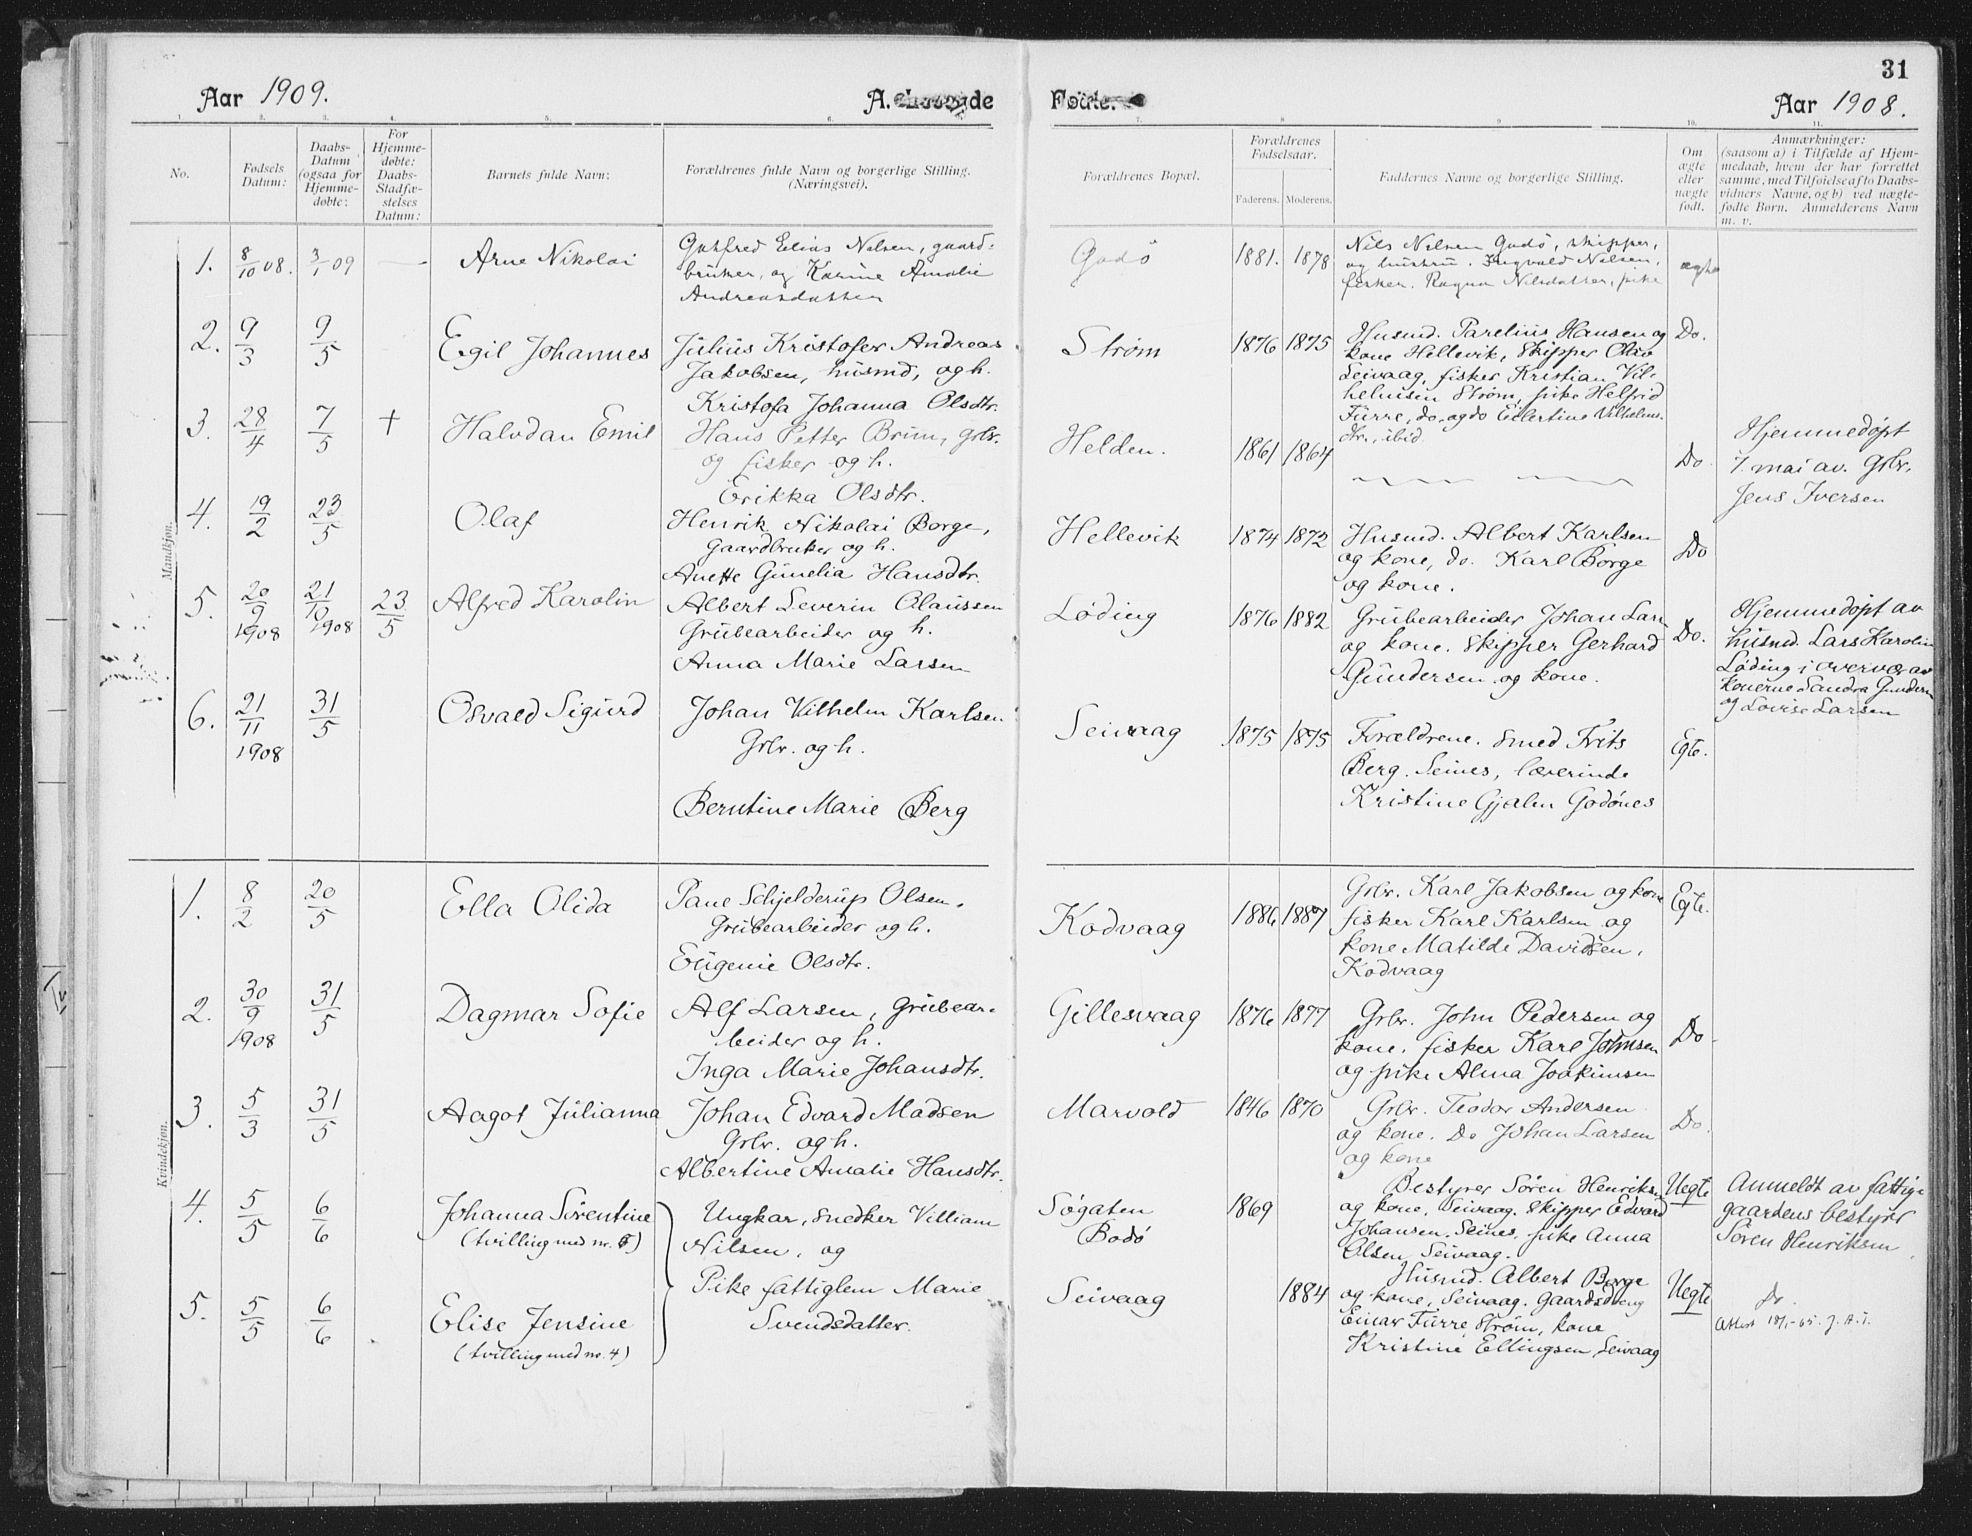 SAT, Ministerialprotokoller, klokkerbøker og fødselsregistre - Nordland, 804/L0081: Ministerialbok nr. 804A02, 1901-1915, s. 31